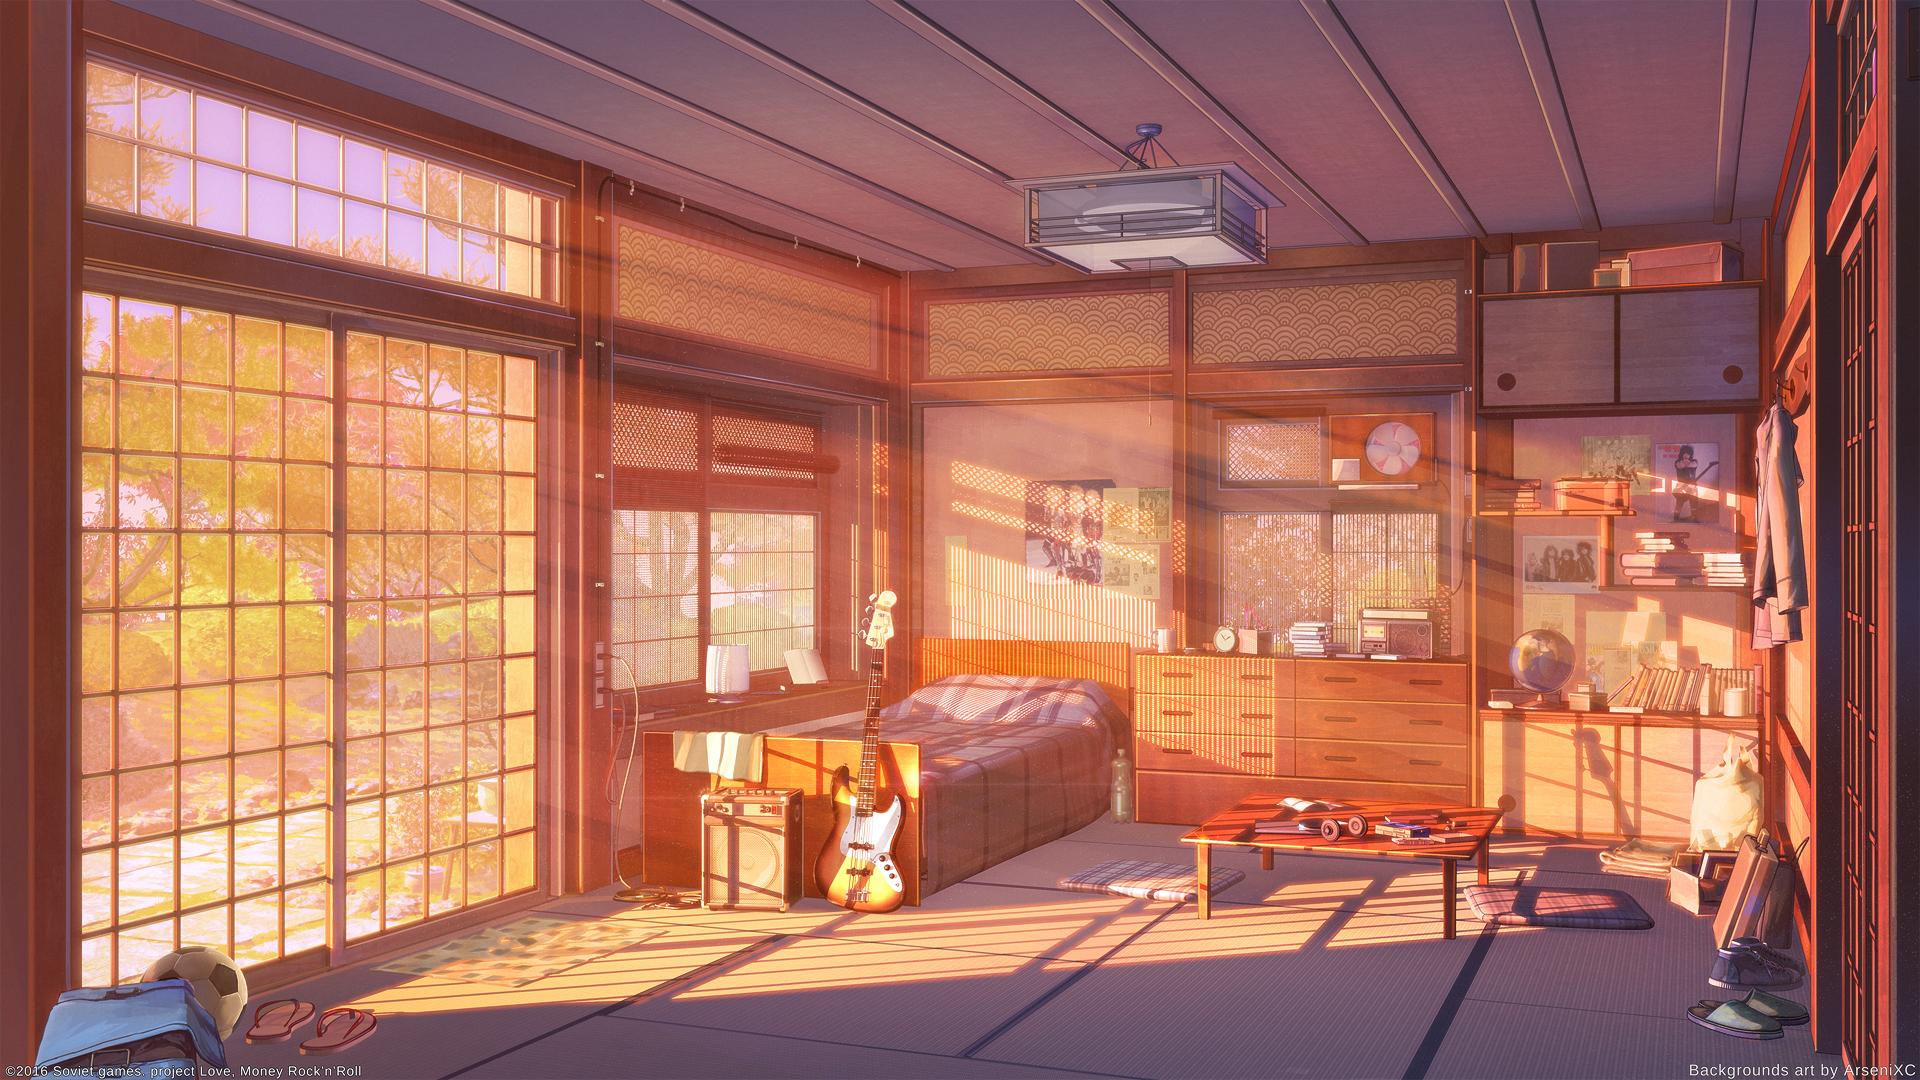 Imanje Uzunami porodice (Shigeru) Room_sunset_version_by_arsenixc-db6892l